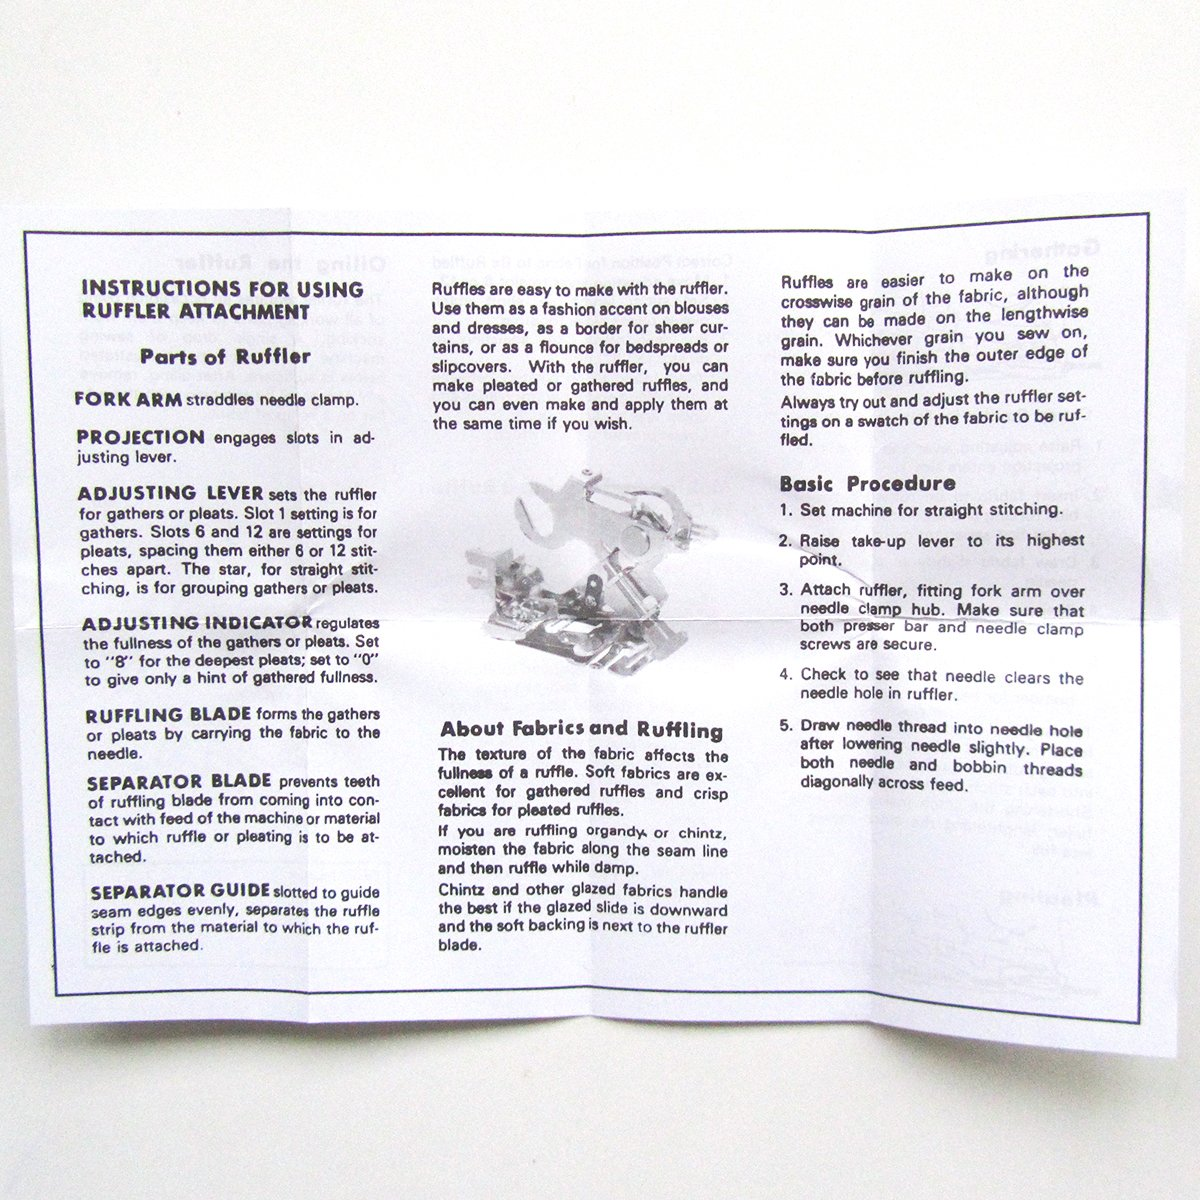 Kunpeng Ruffler Foot For All Old Style Bernina Sewing 830 Machine Threading Diagram Machines 153055705 0019477000 1pcs